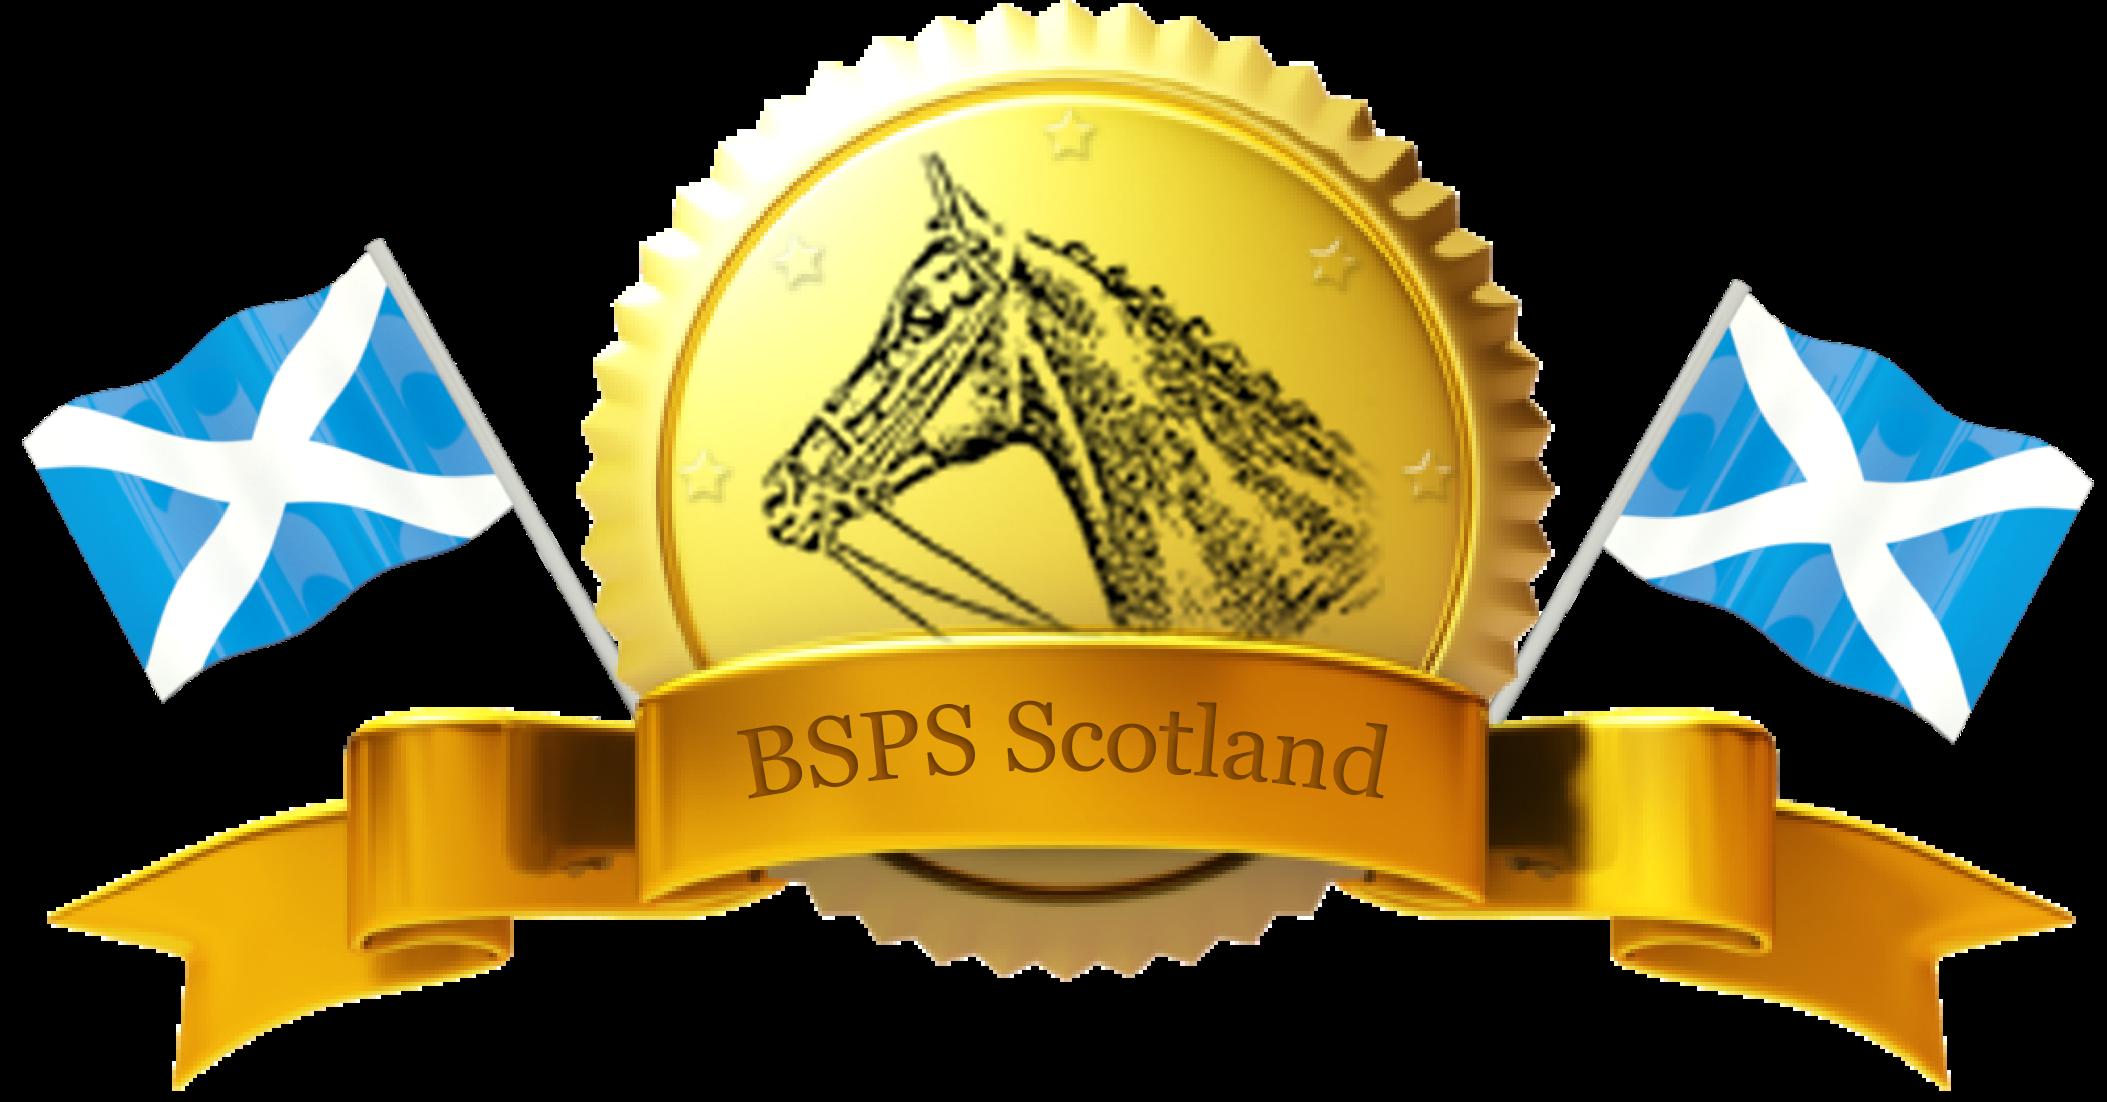 BSPS Scotland